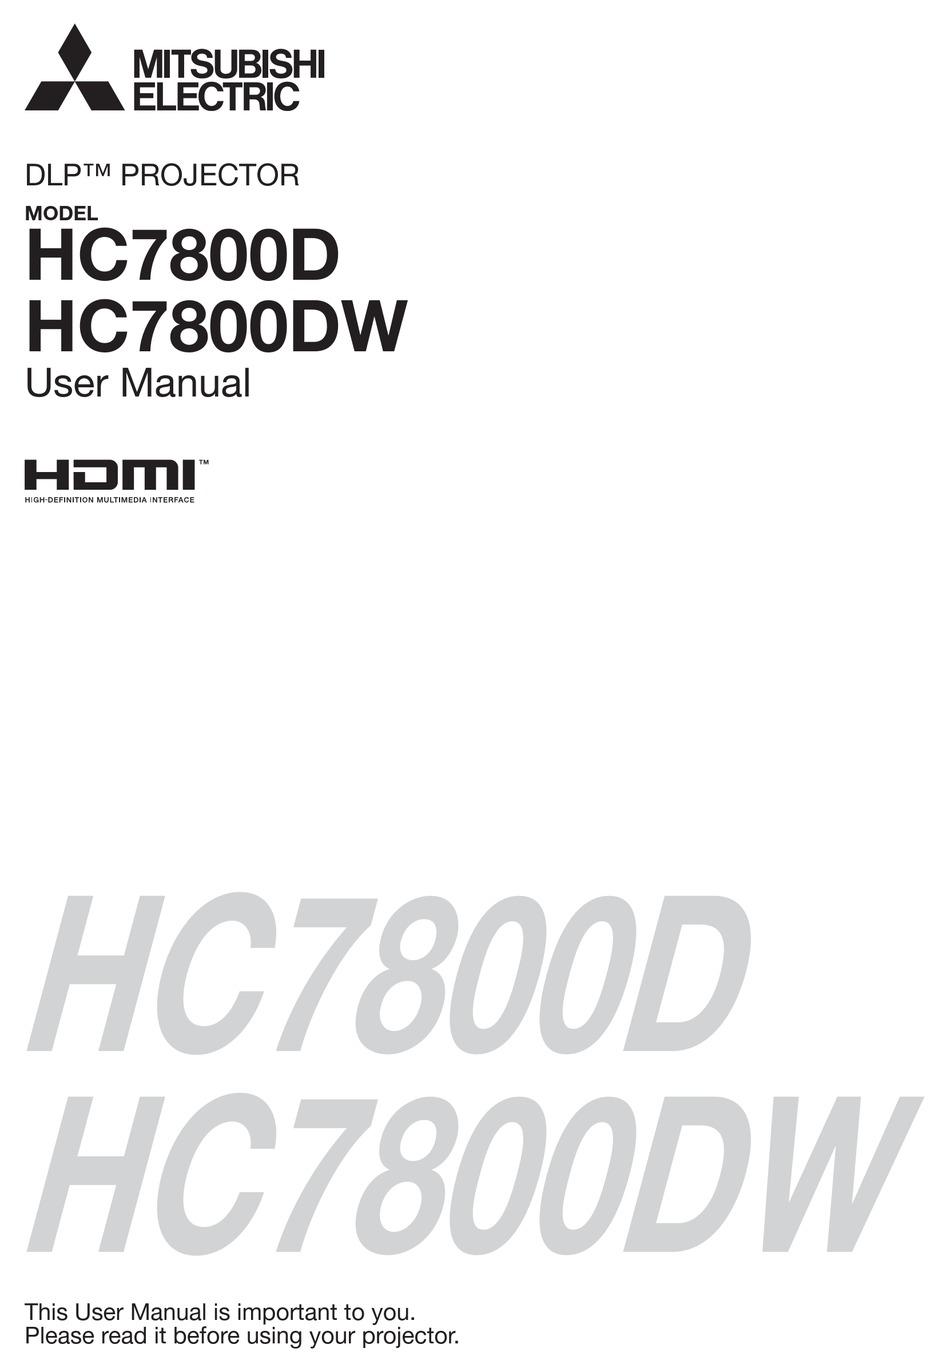 Projector Mitsubishi Electric Dlp Hc7800d User Manual